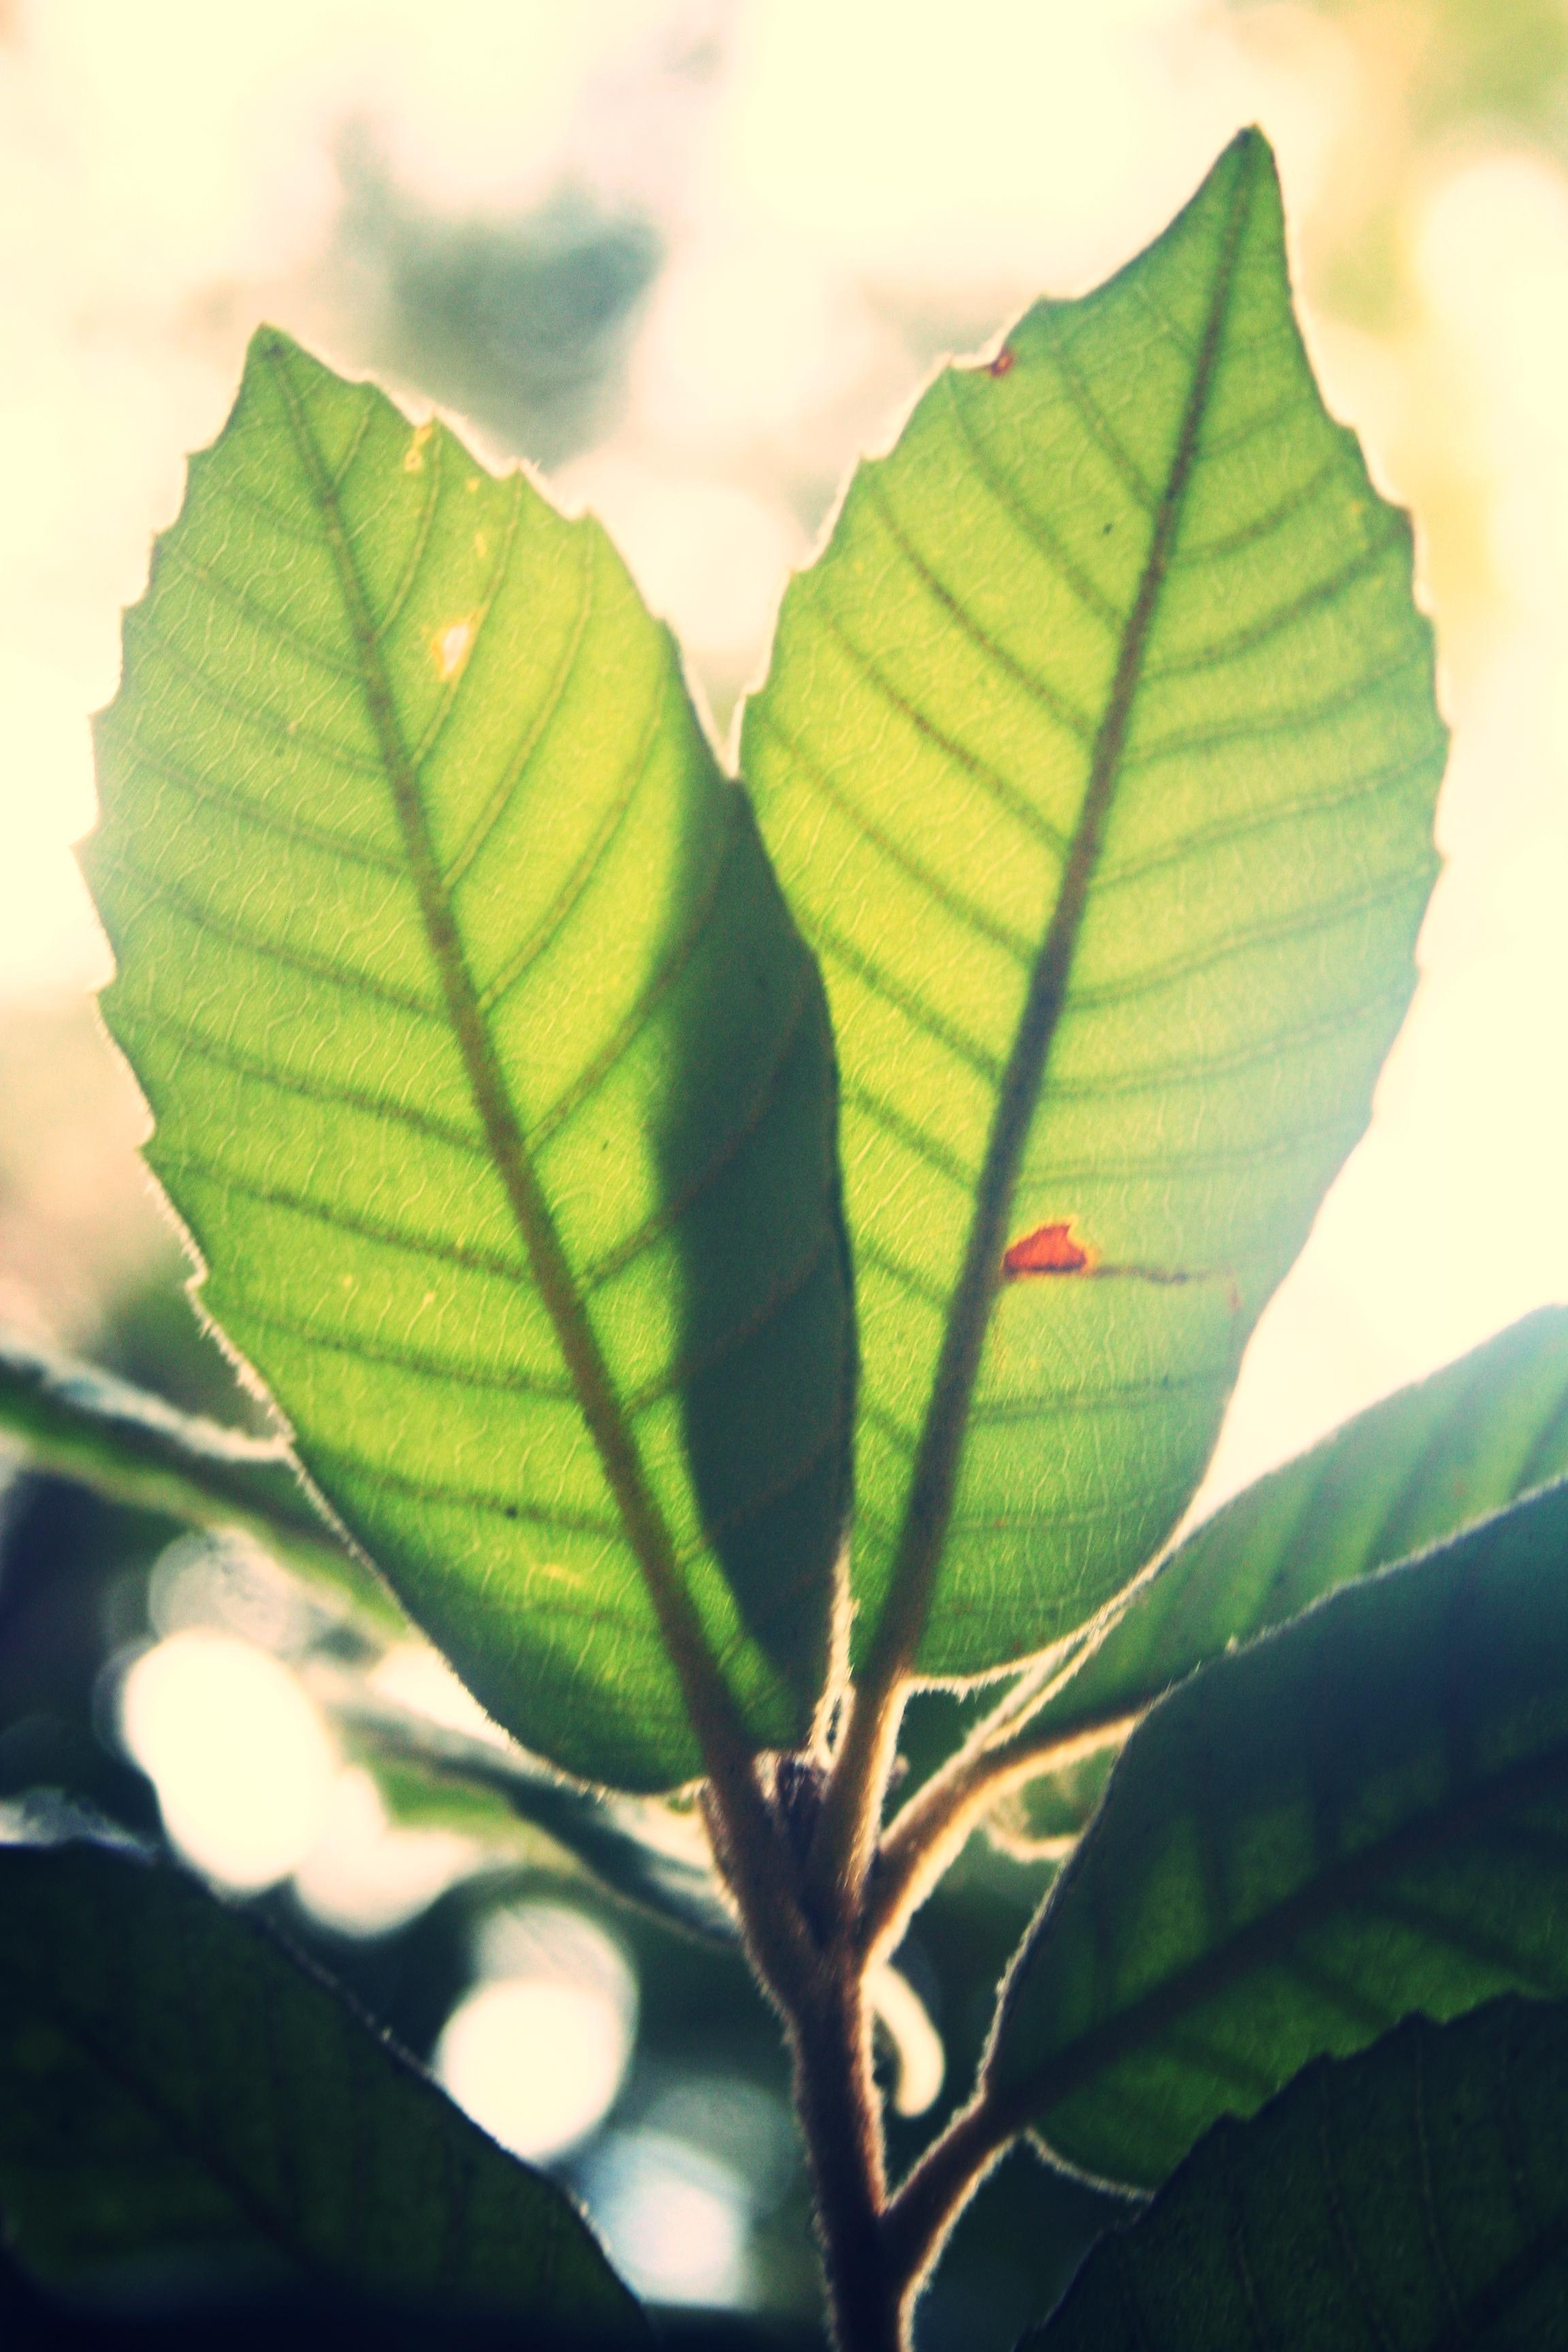 Coastal subspecies of Tanbark oak, Notholithocarpus densiflorus (Fagaceae)